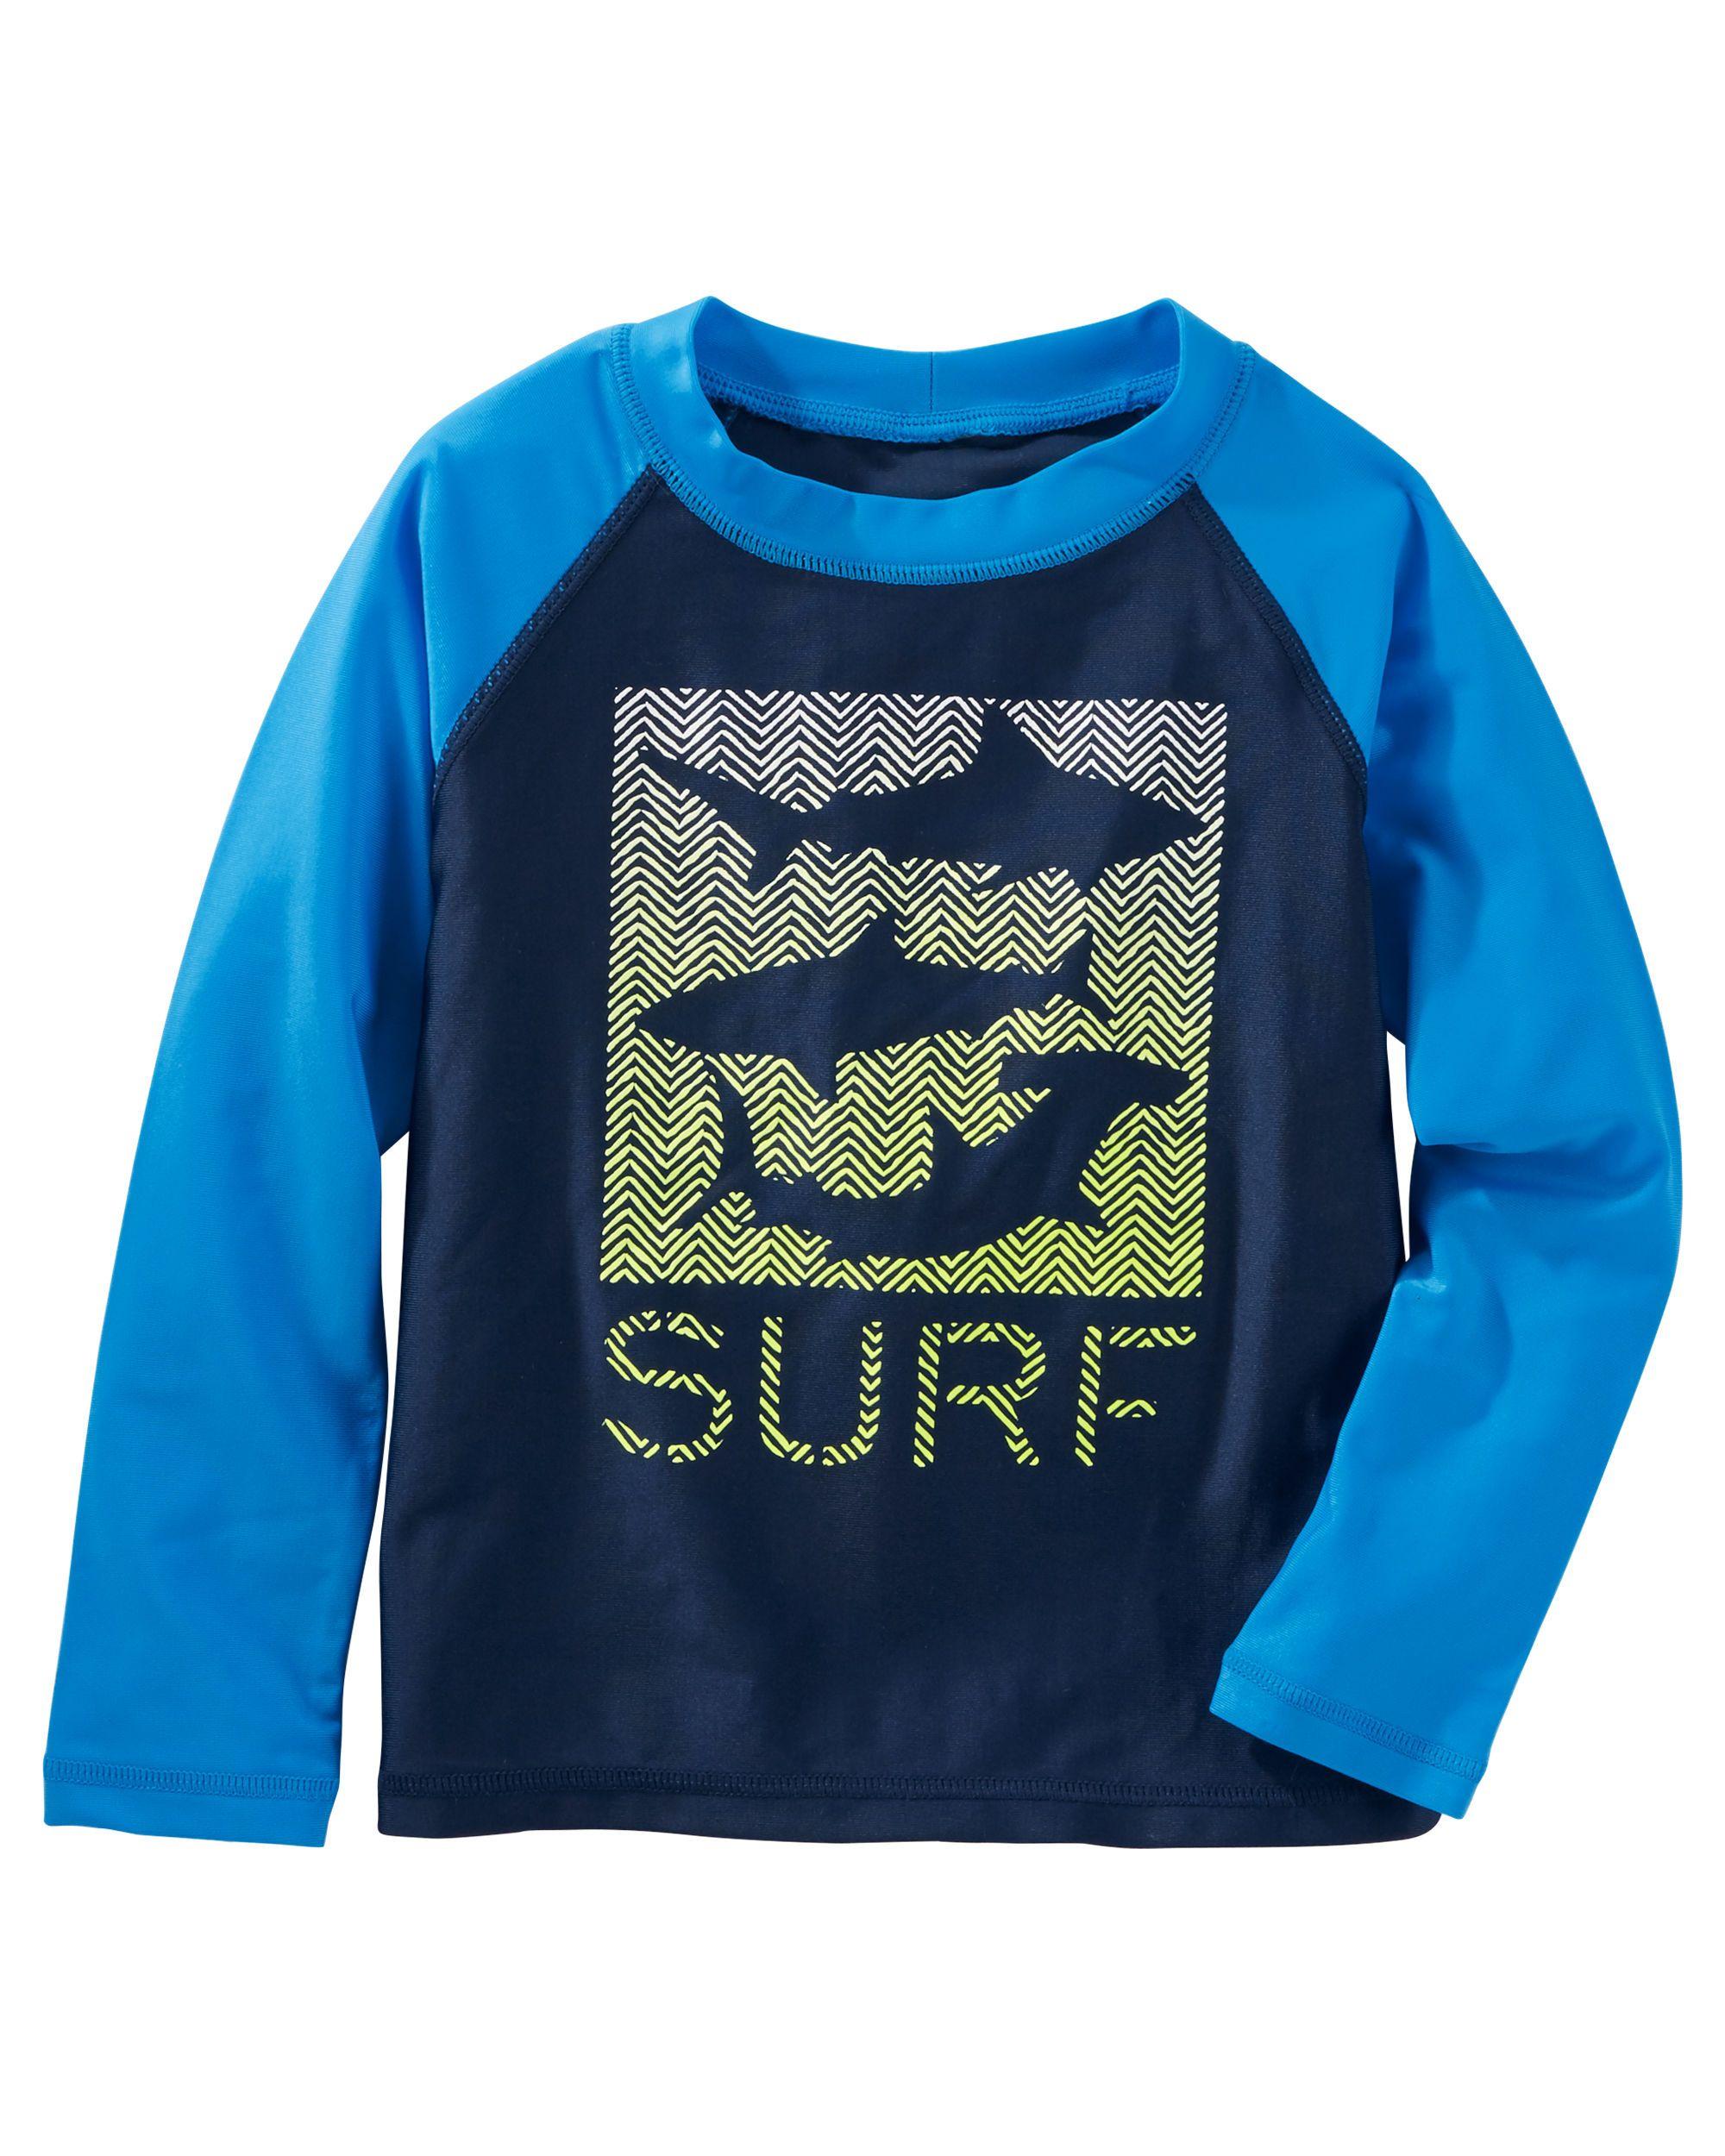 Osh Kosh Baby Boys Surf Crew Short Sleeve Rash Guard Set